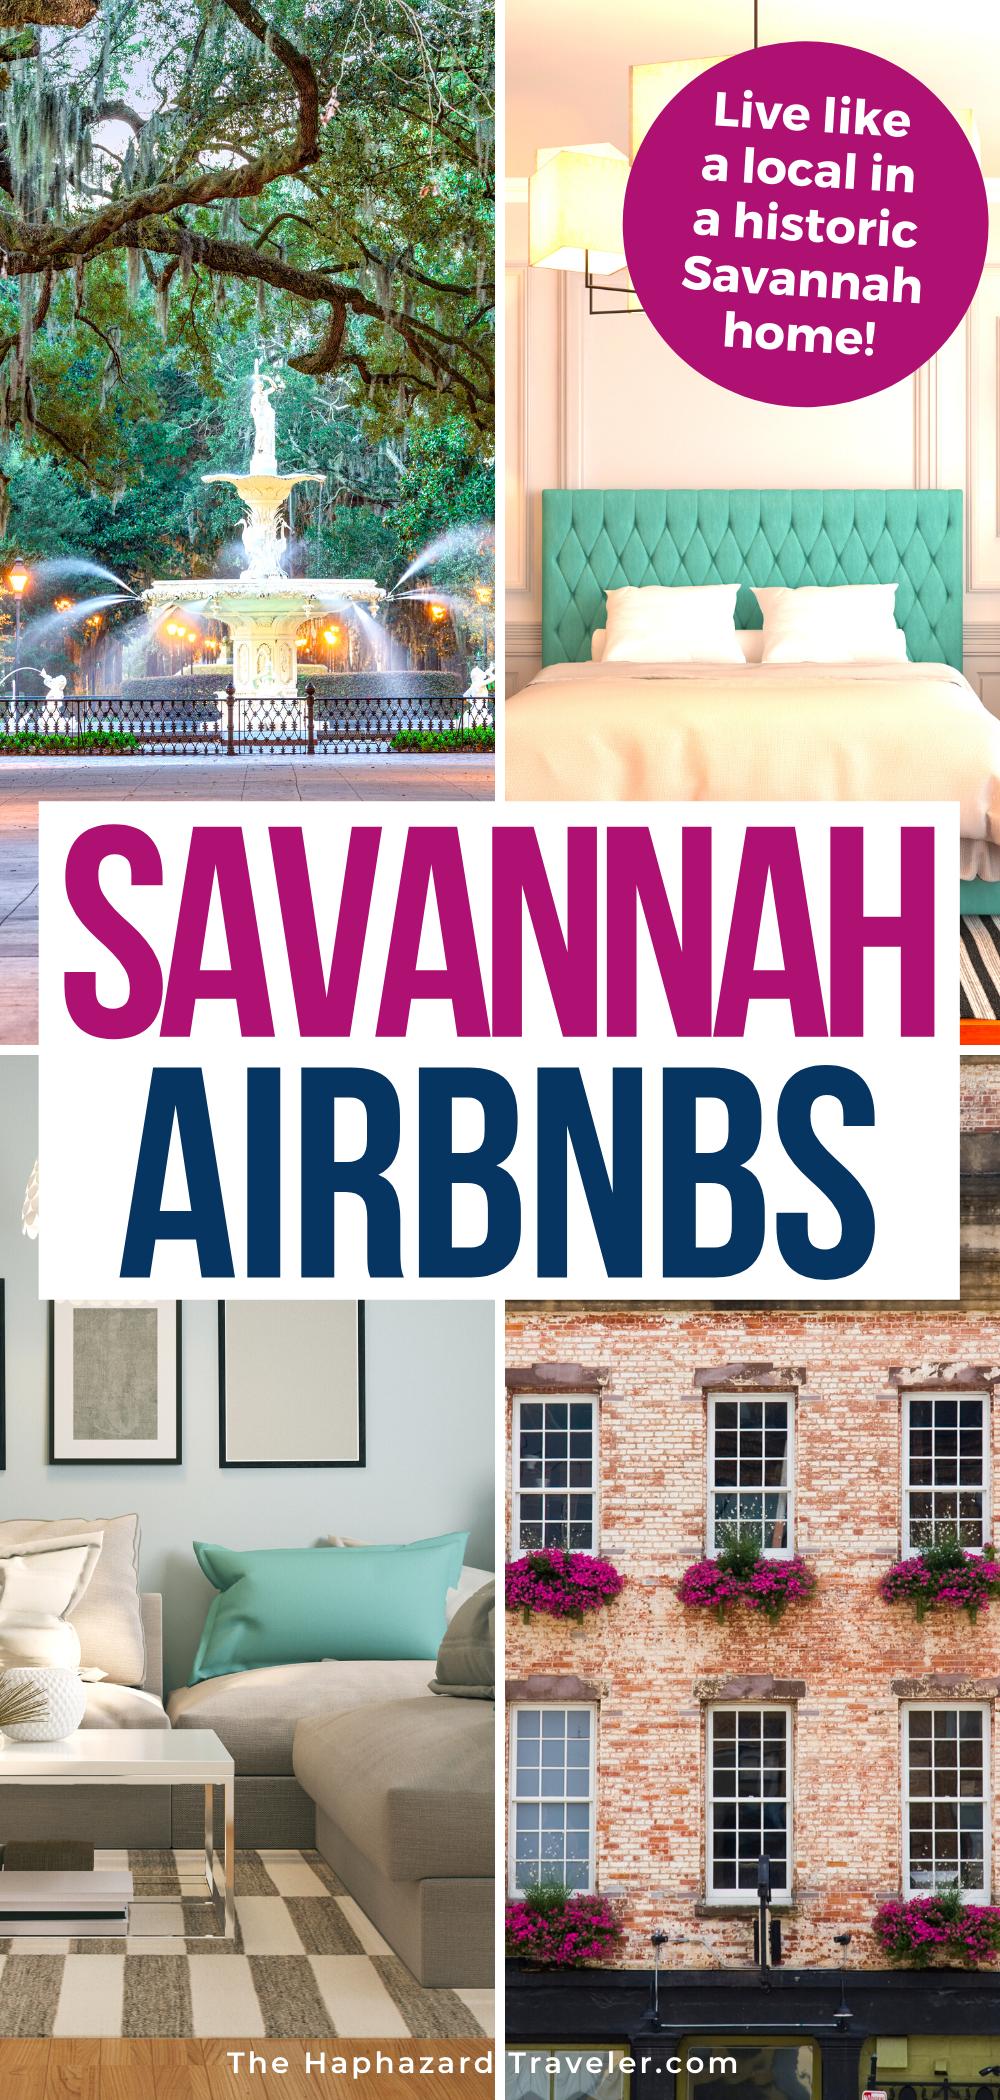 Airbnb Savannah Georgia Historic Stays Neighborhood Tips In 2021 All Inclusive Beach Resorts Vacation Usa Savannah Chat